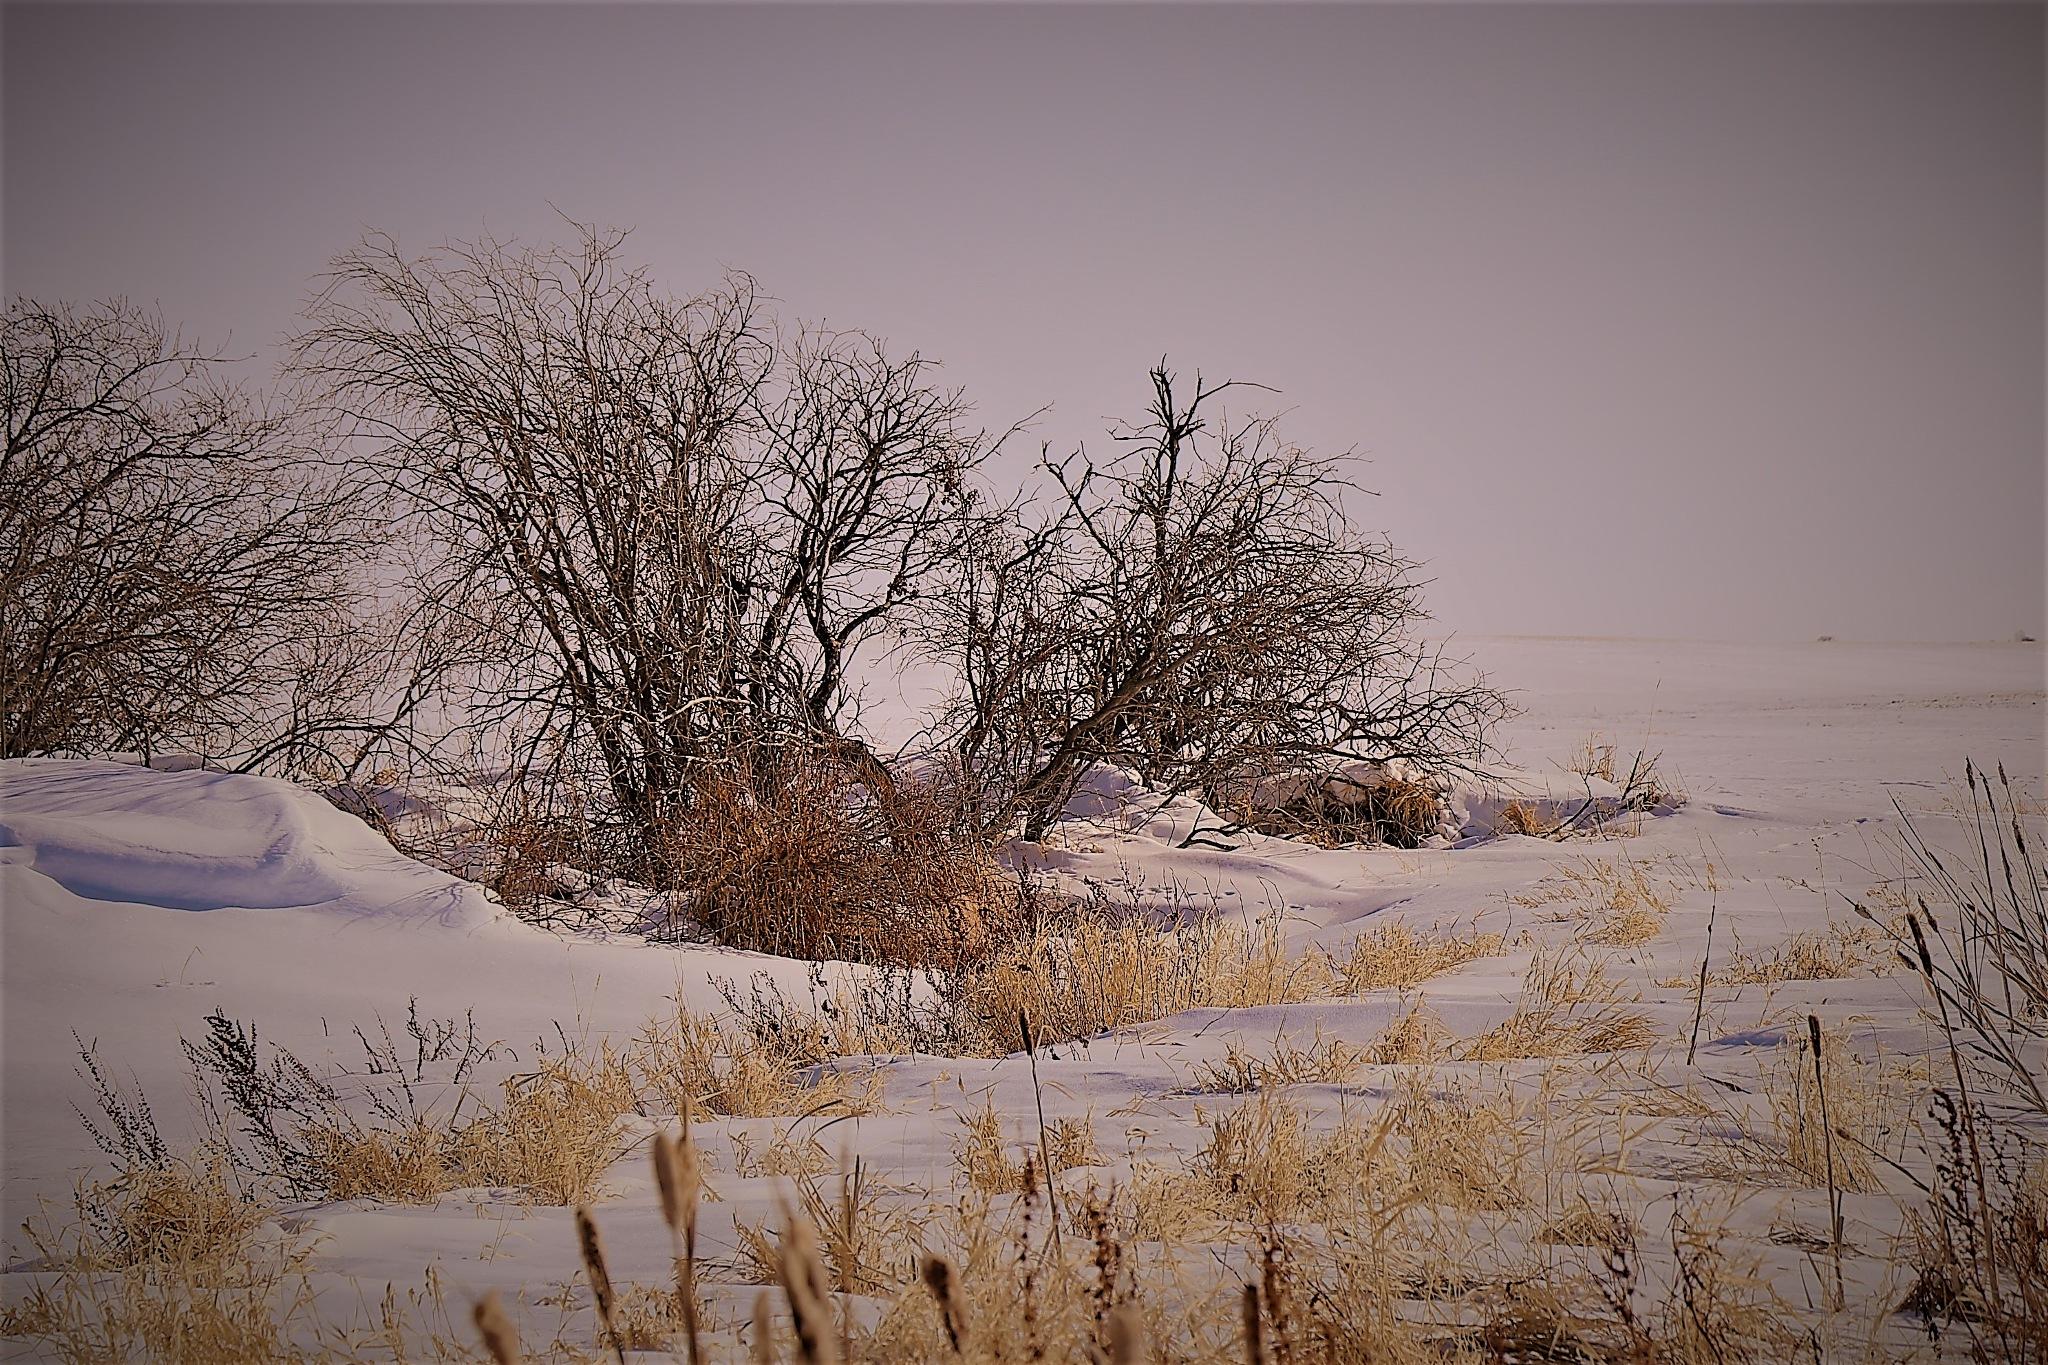 winter wonderland by Rhyland Cottingham